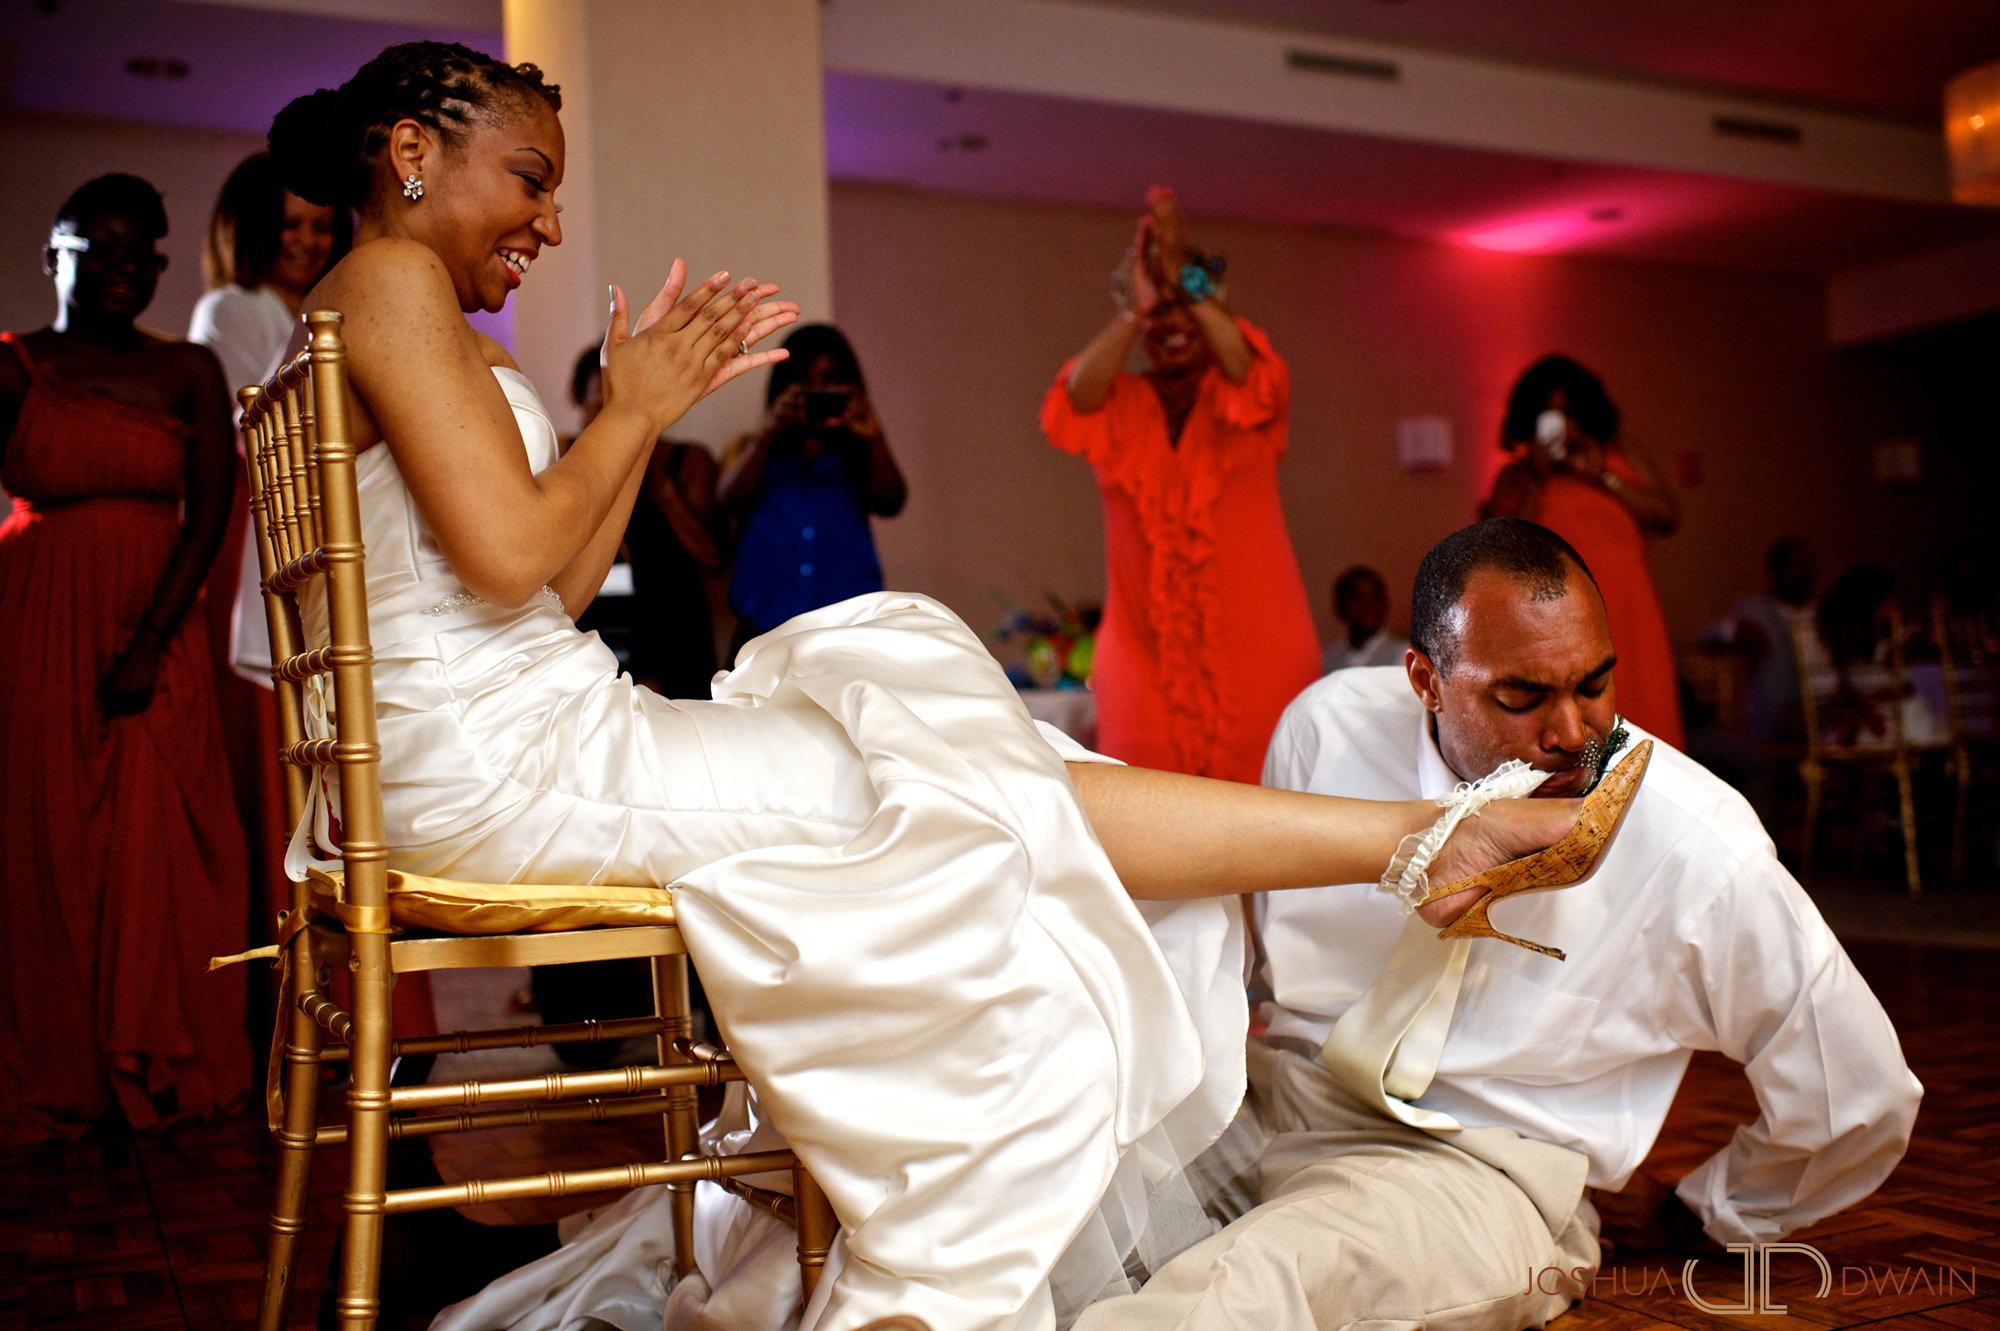 candra-alonza-014-holiday-inn-south-beach-miami-wedding-photographer-joshua-dwain-2012-07-28_ca_391